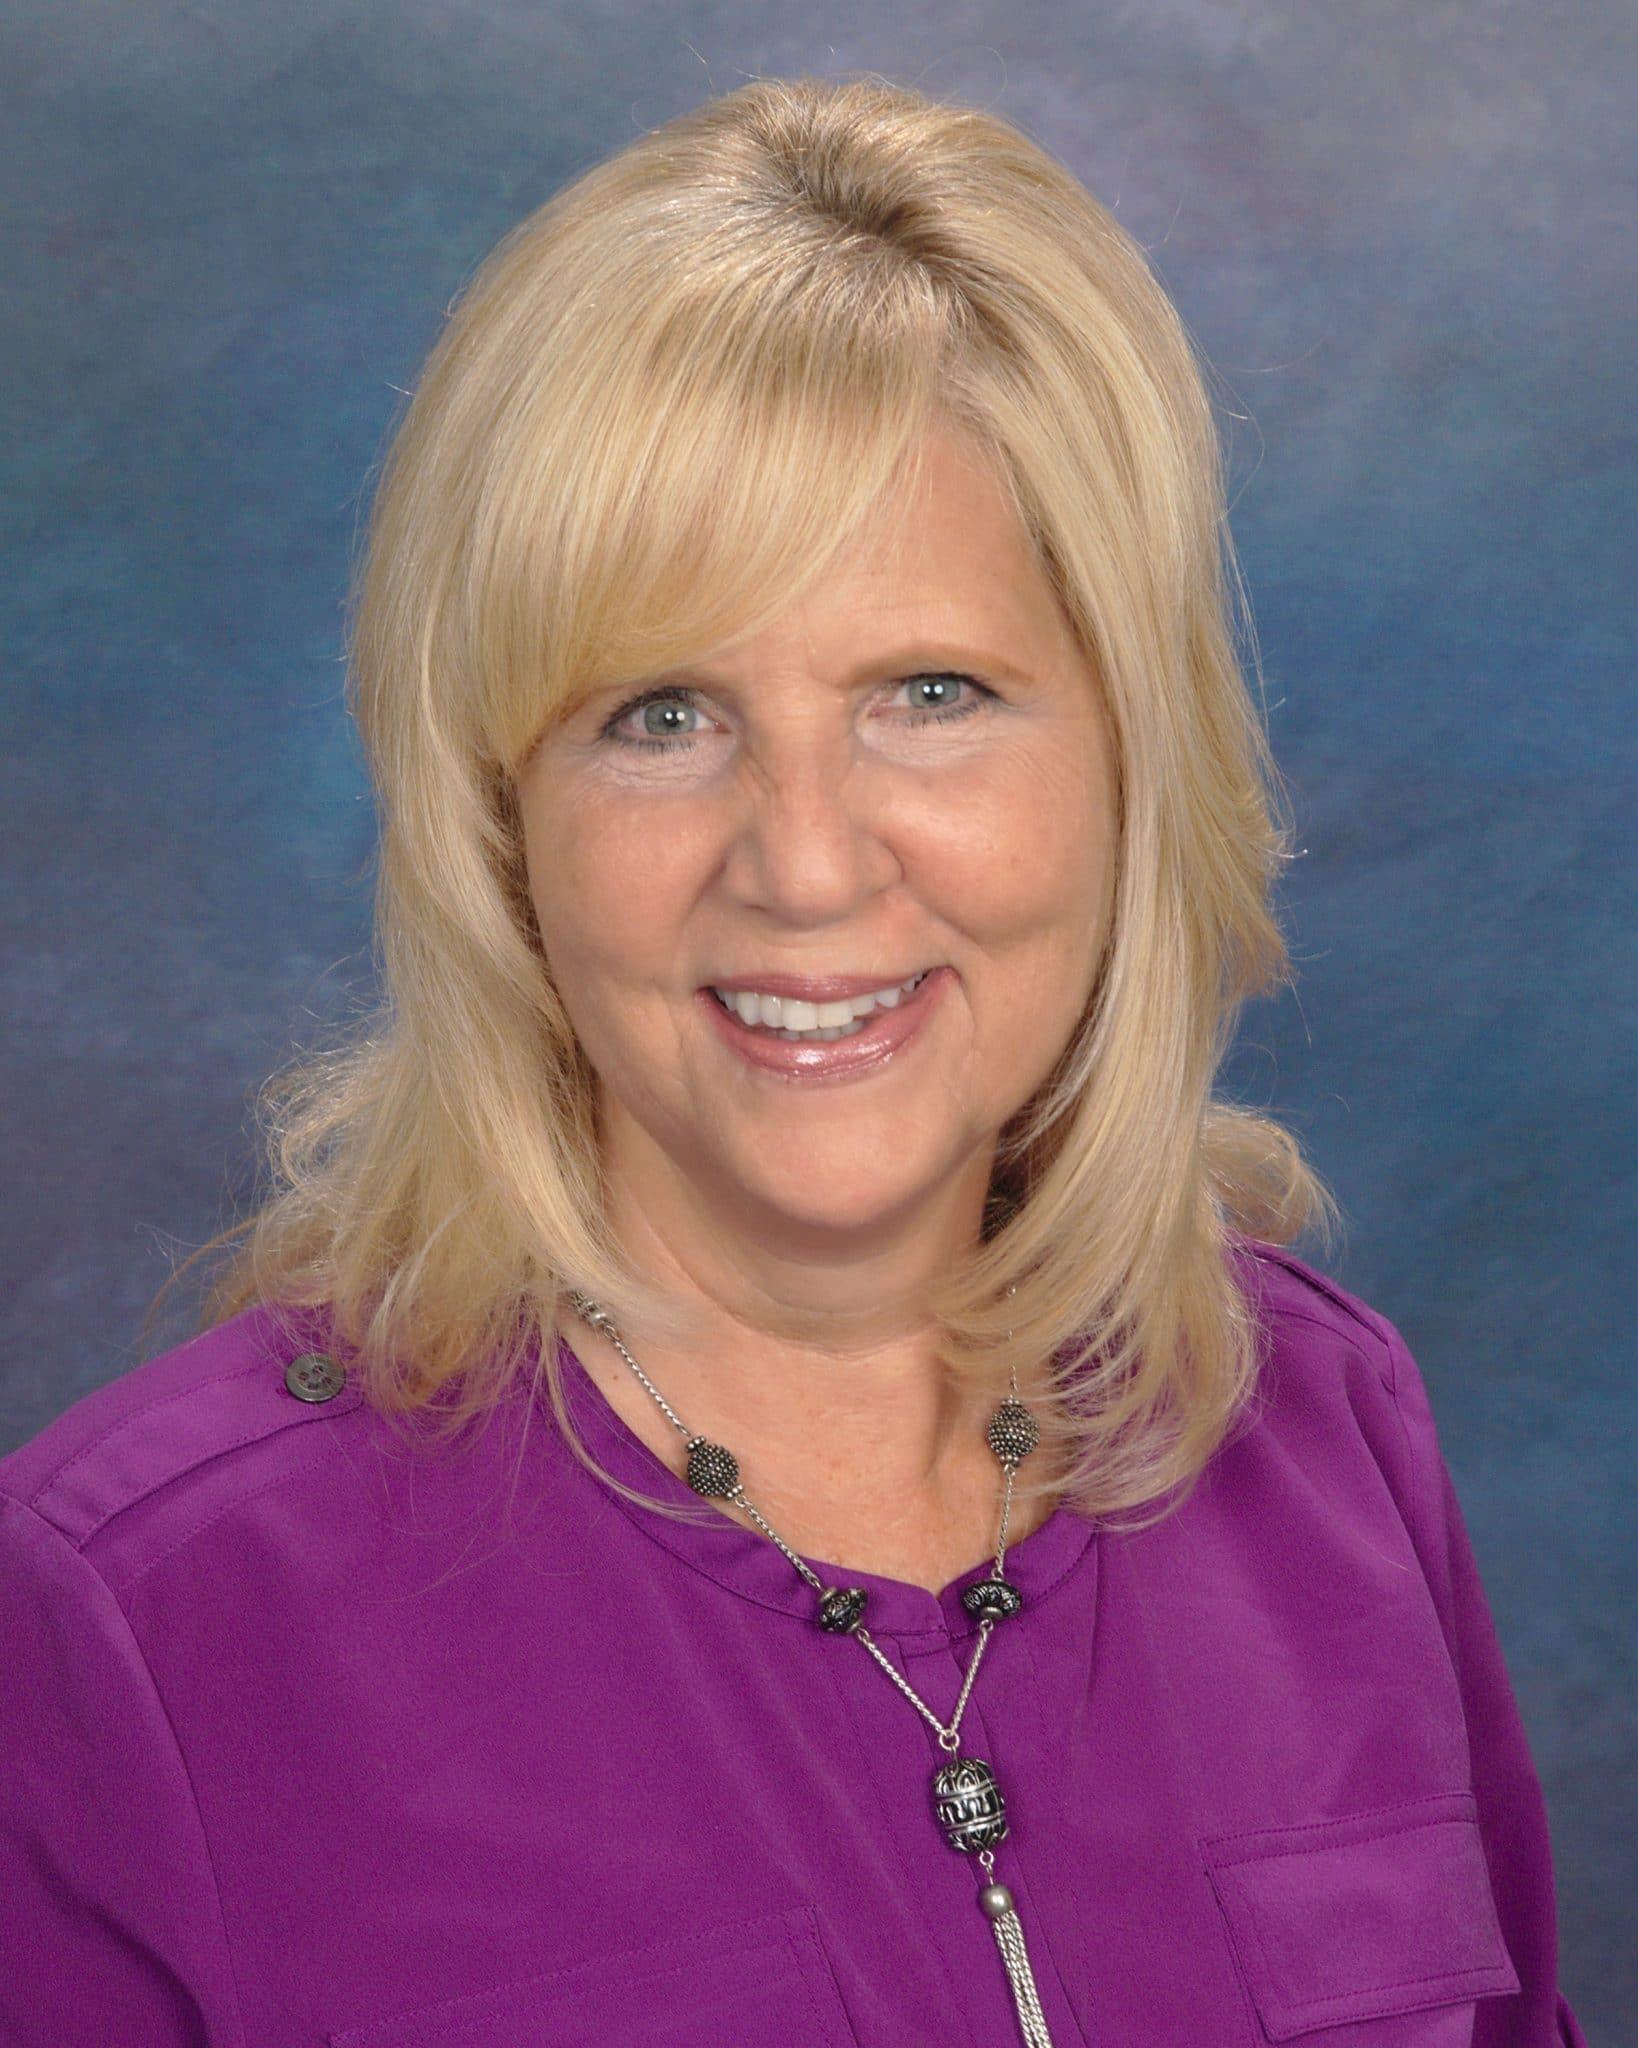 Mitzi Steele, MFT Intern, New Growth Counseling, Carlsbad CA